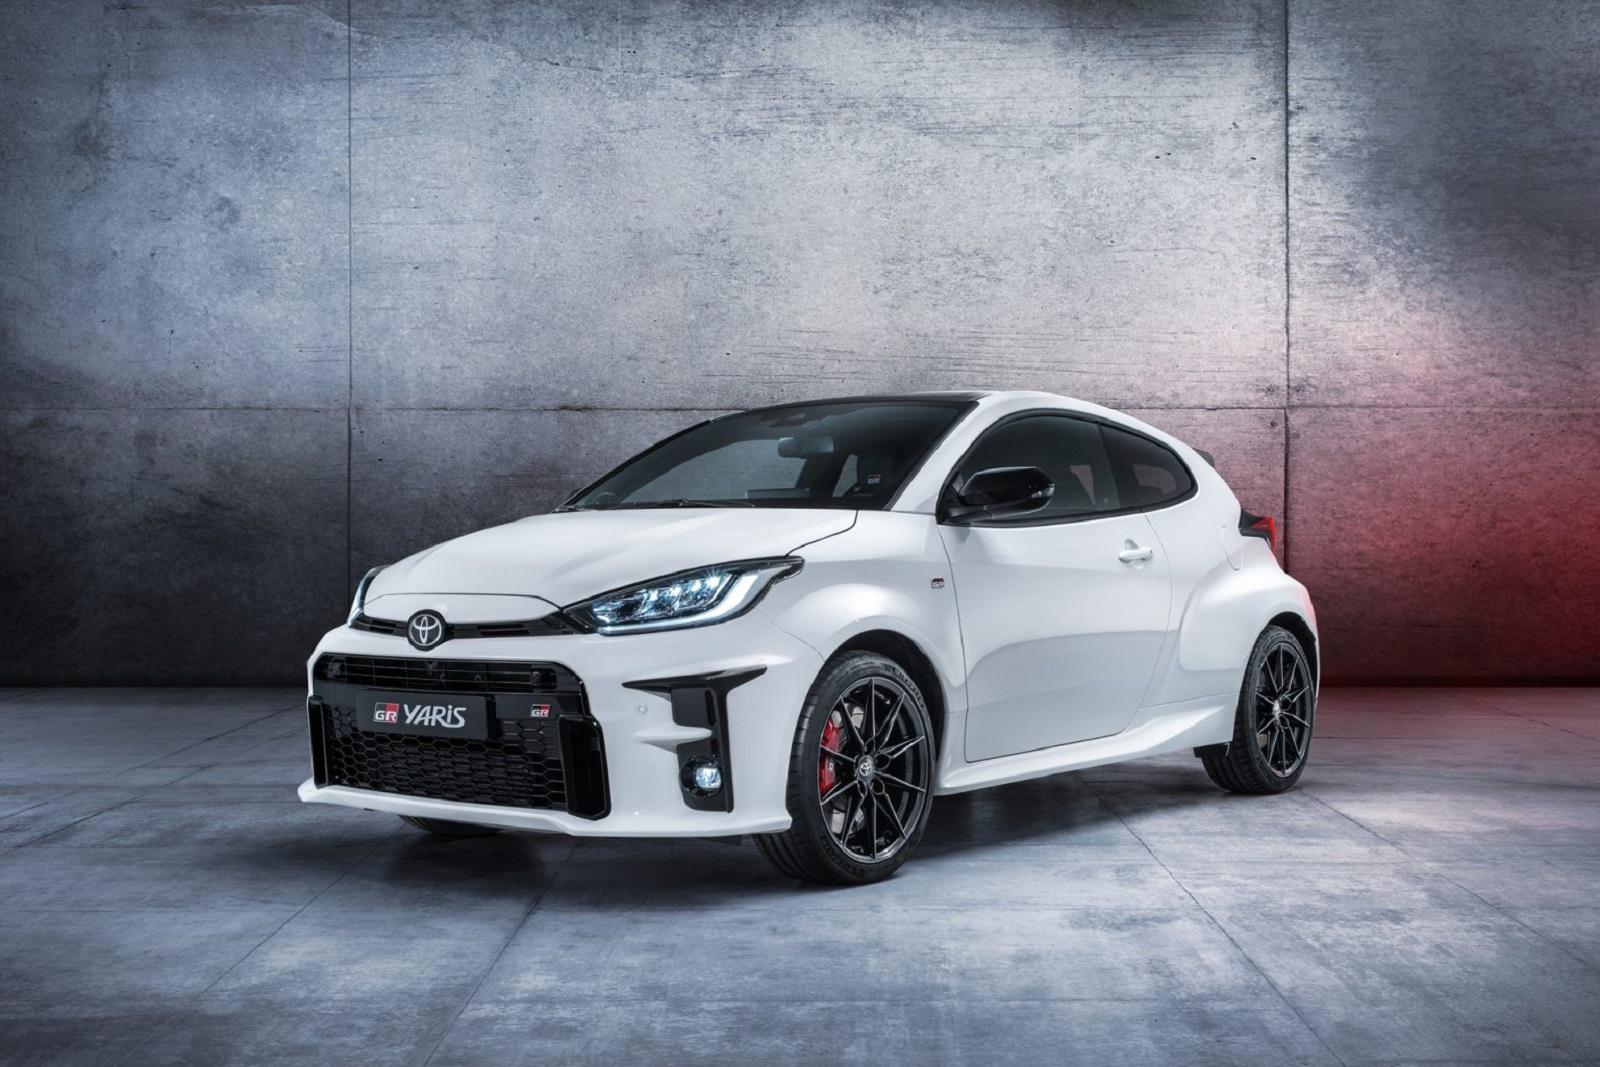 Toyota Gr Yaris Hidrogeno (1)